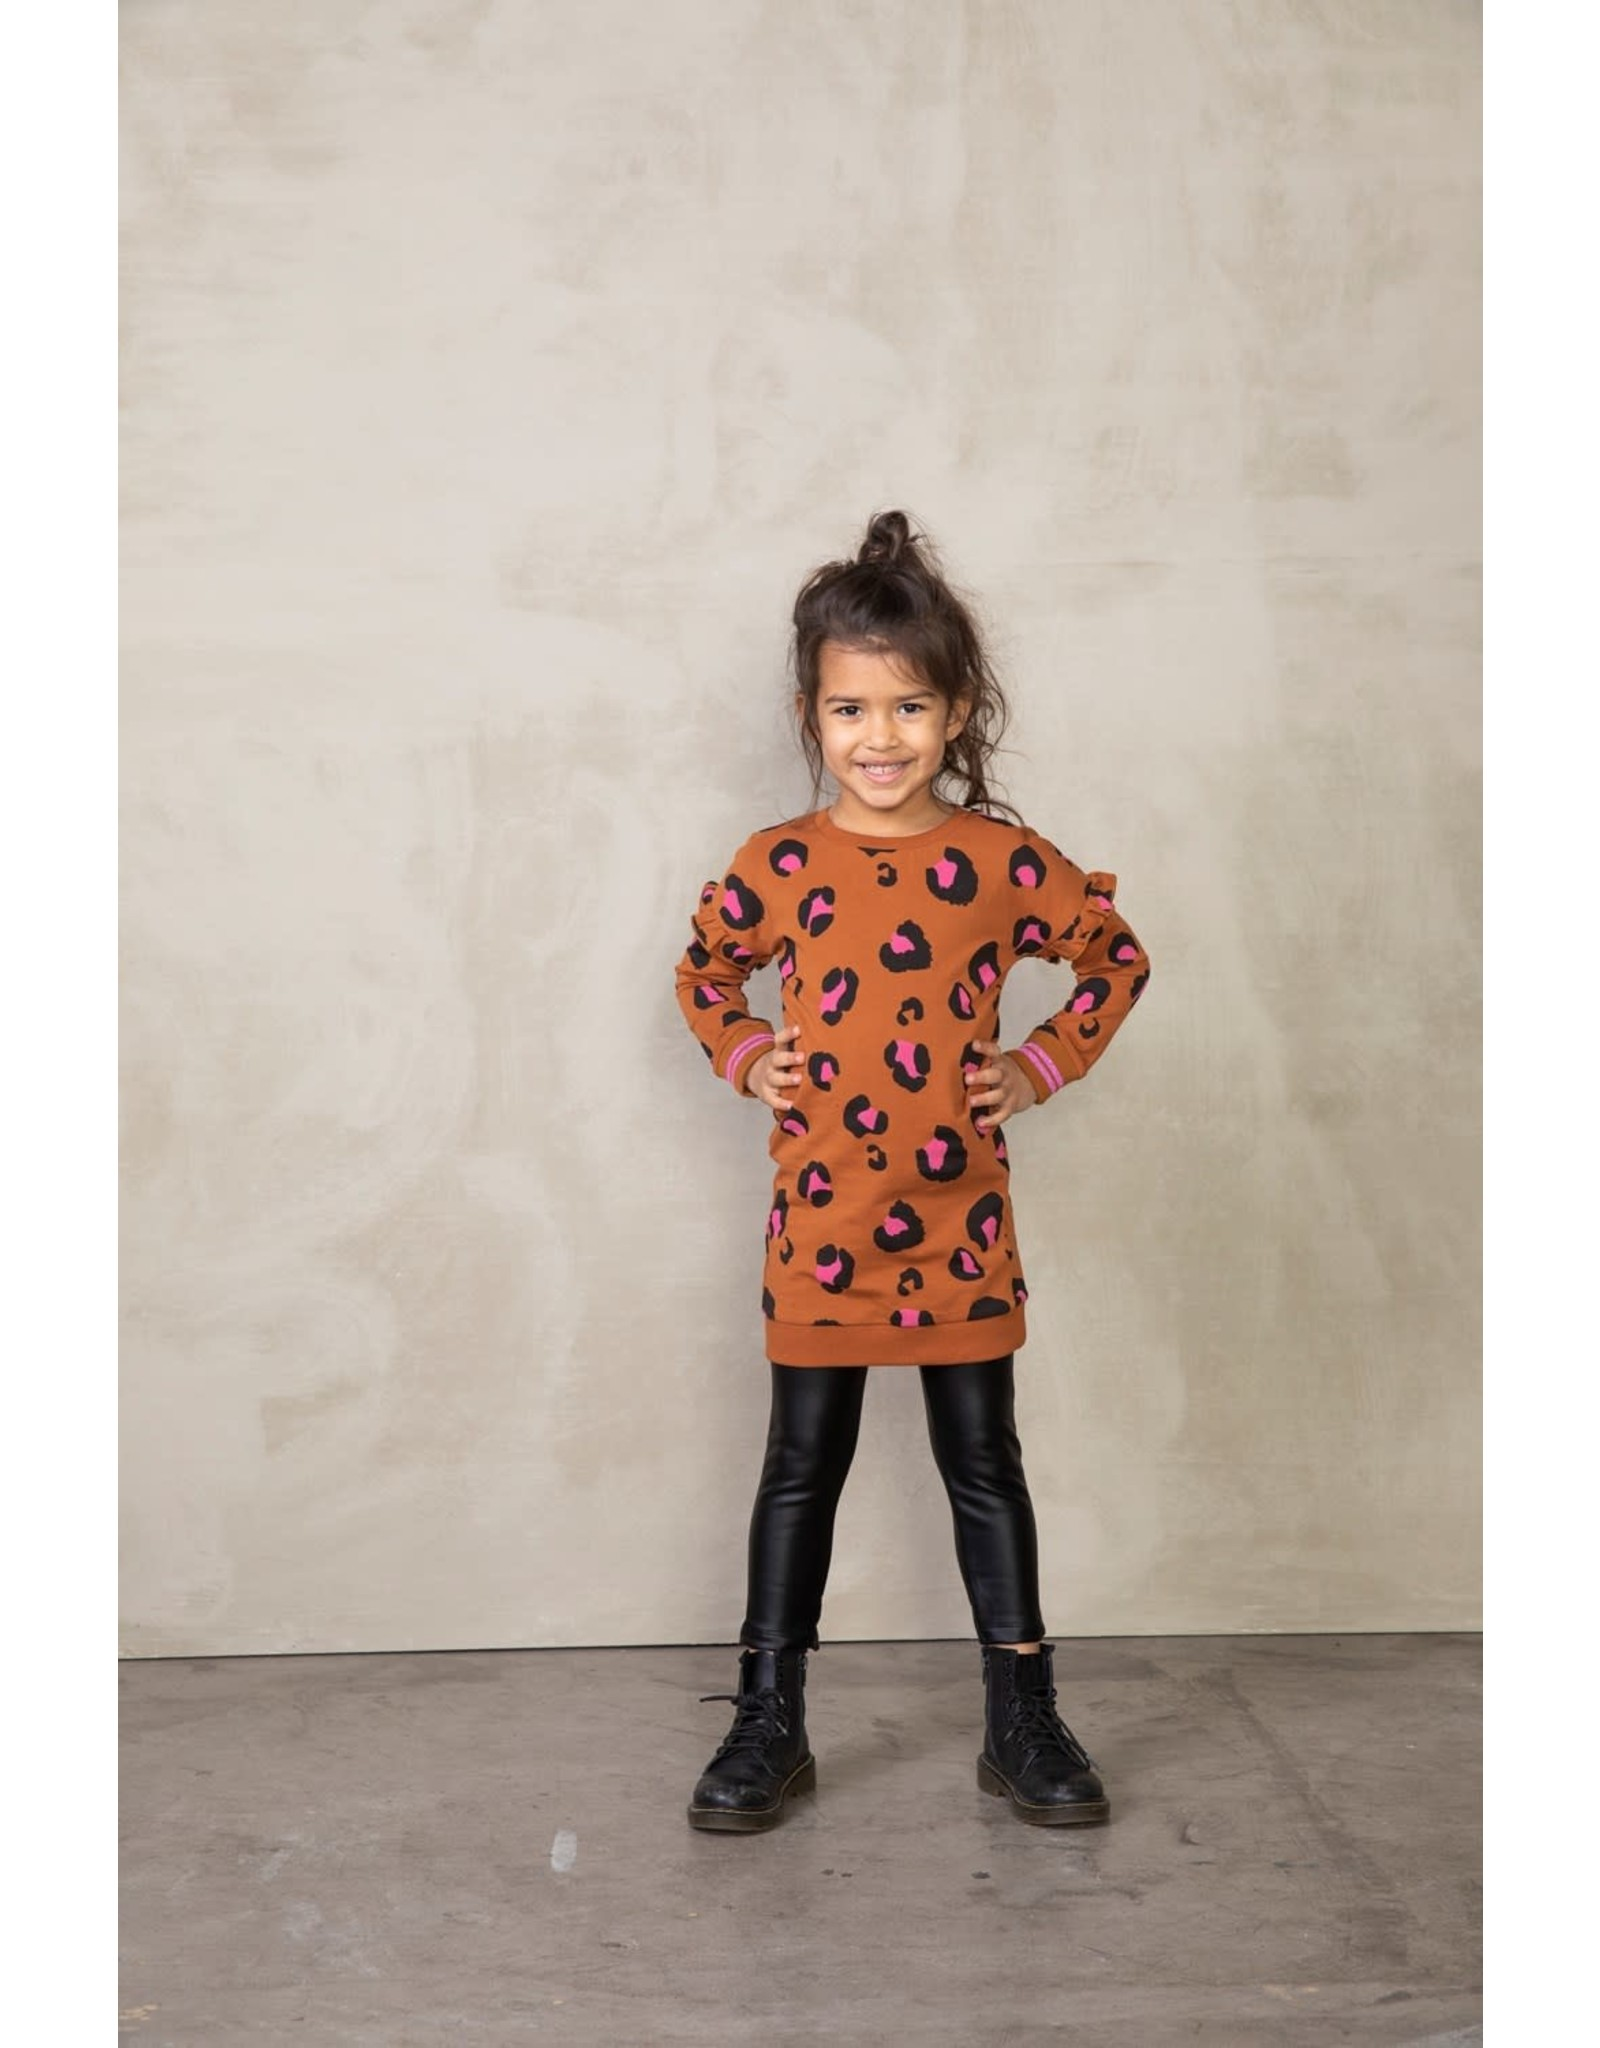 Jubel Jubel meisjes legging lederlook Zwart